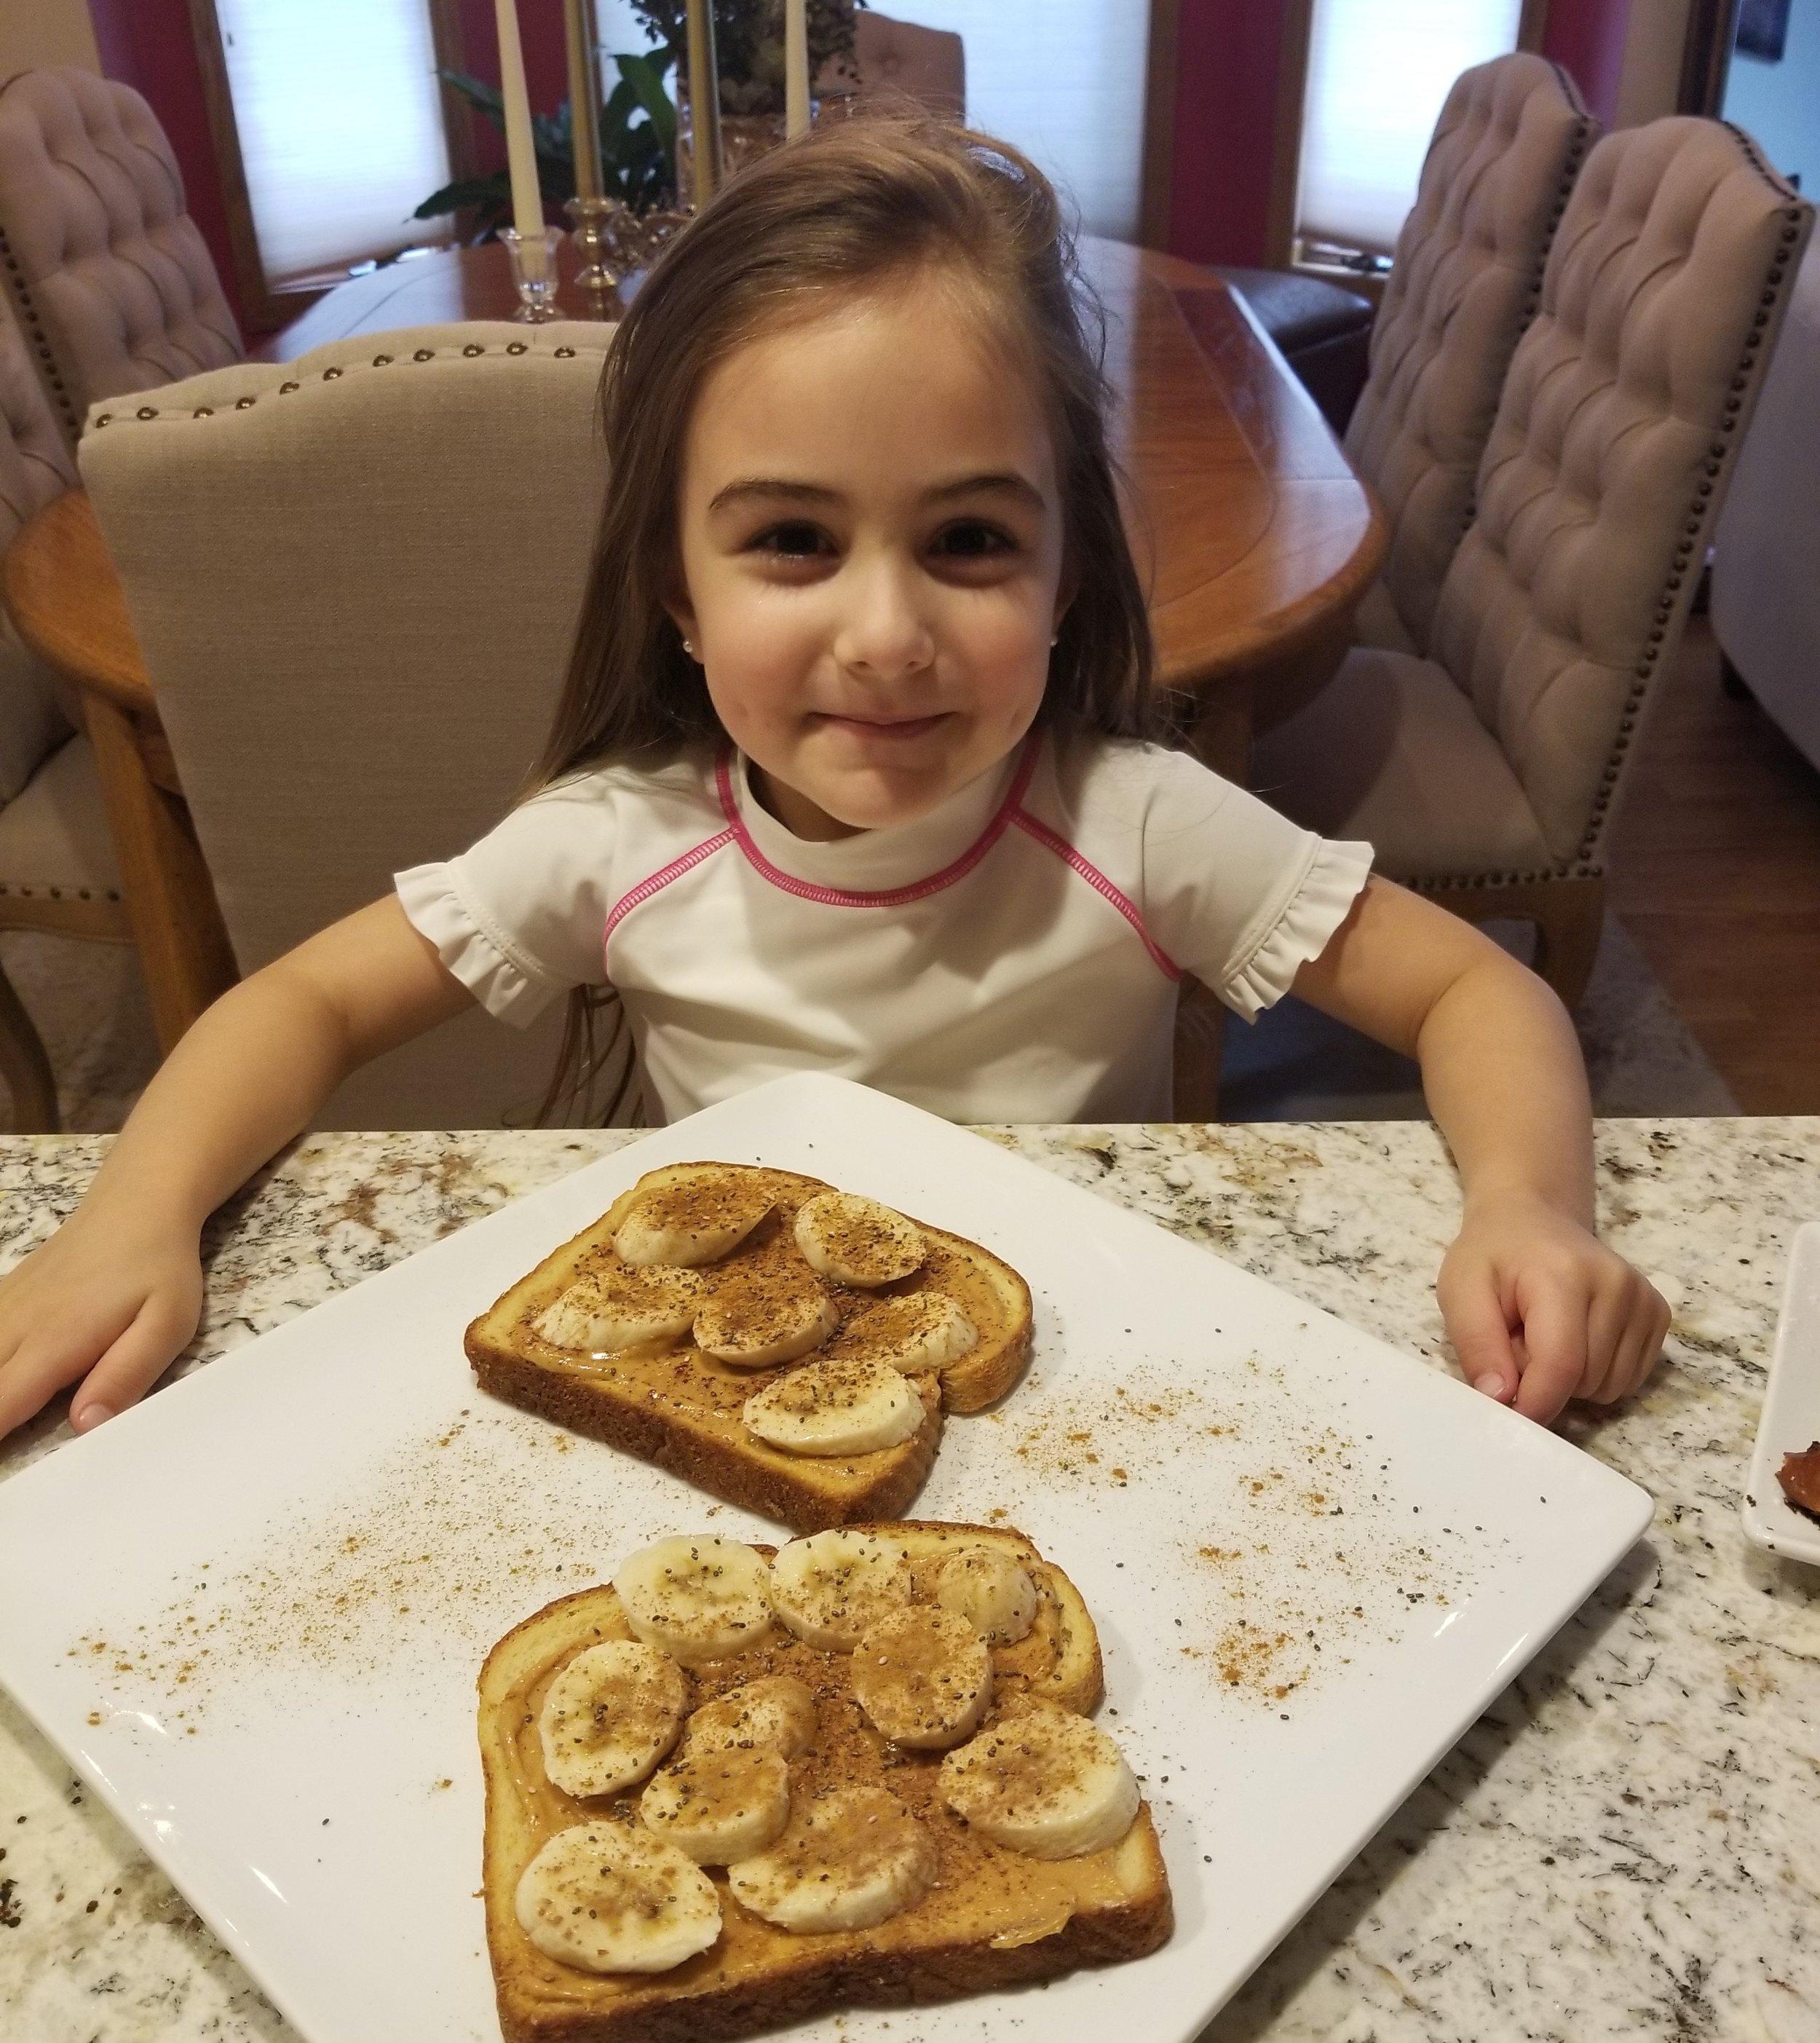 Anjolie enjoying her peanut butter and banana Hawaiian toast.